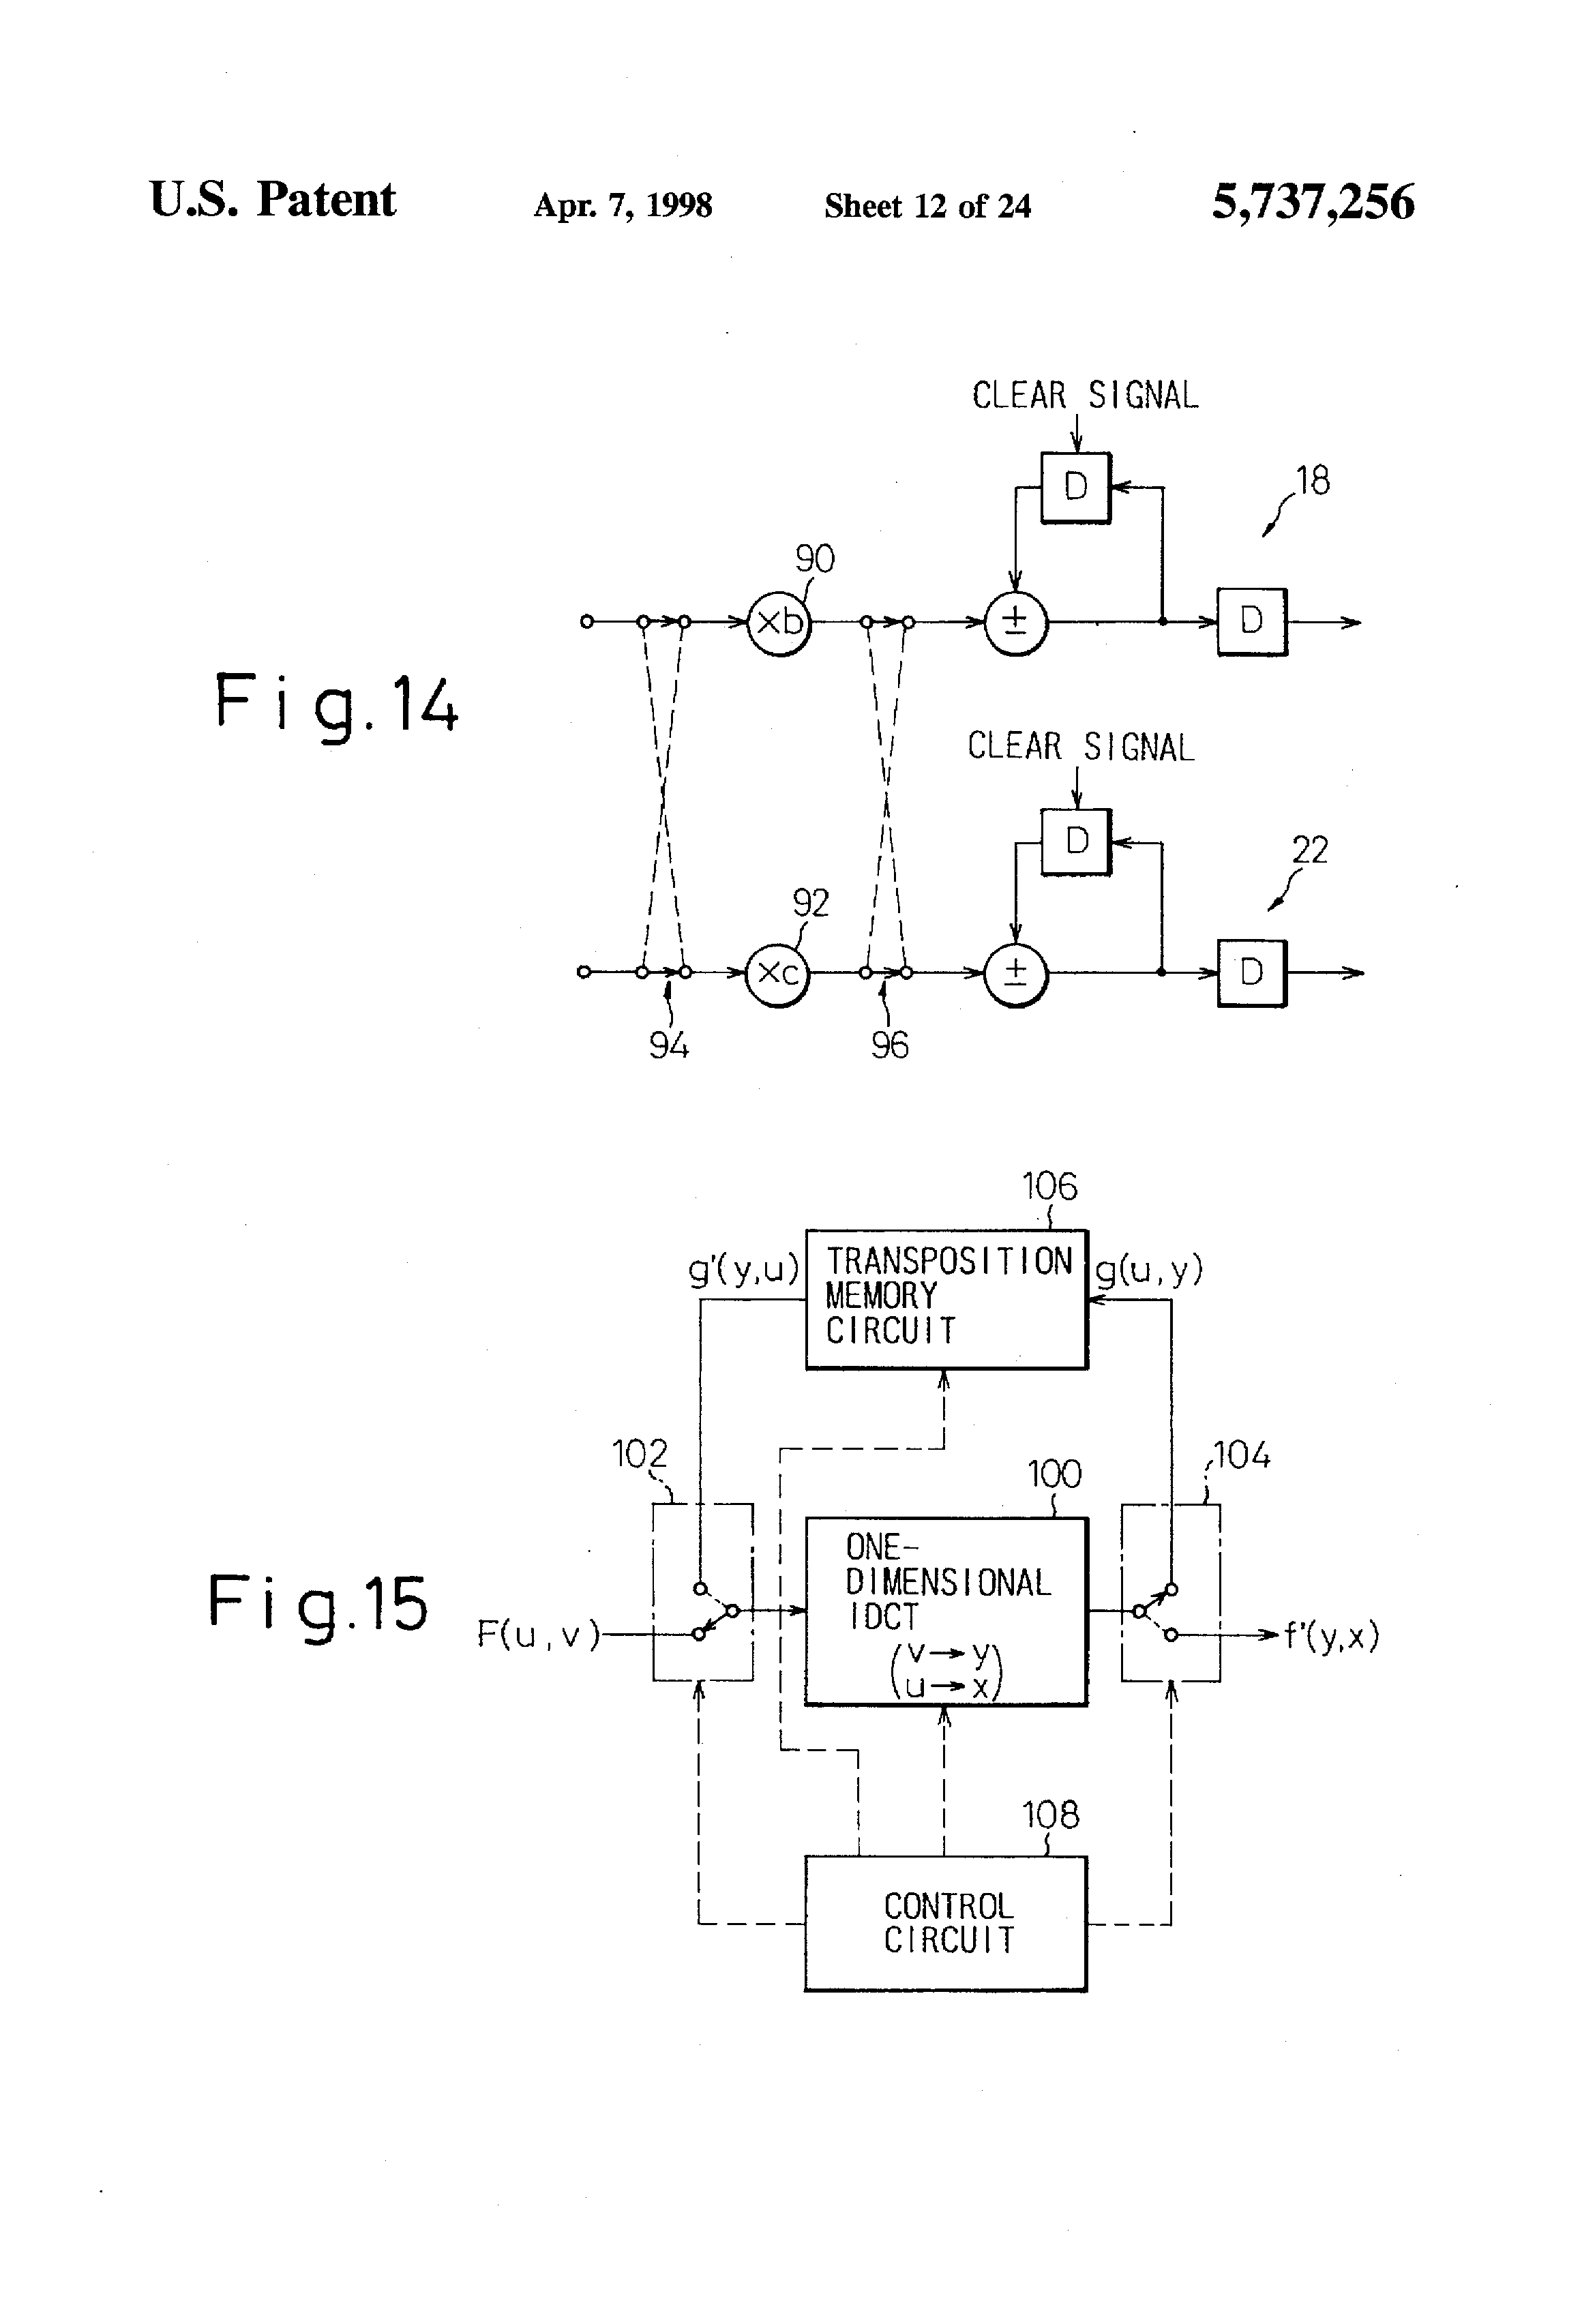 the discrete cosine transform Transform description this function realizes direct or inverse 1-d or n-d discrete cosine transforms with shift depending on the option parameter value.